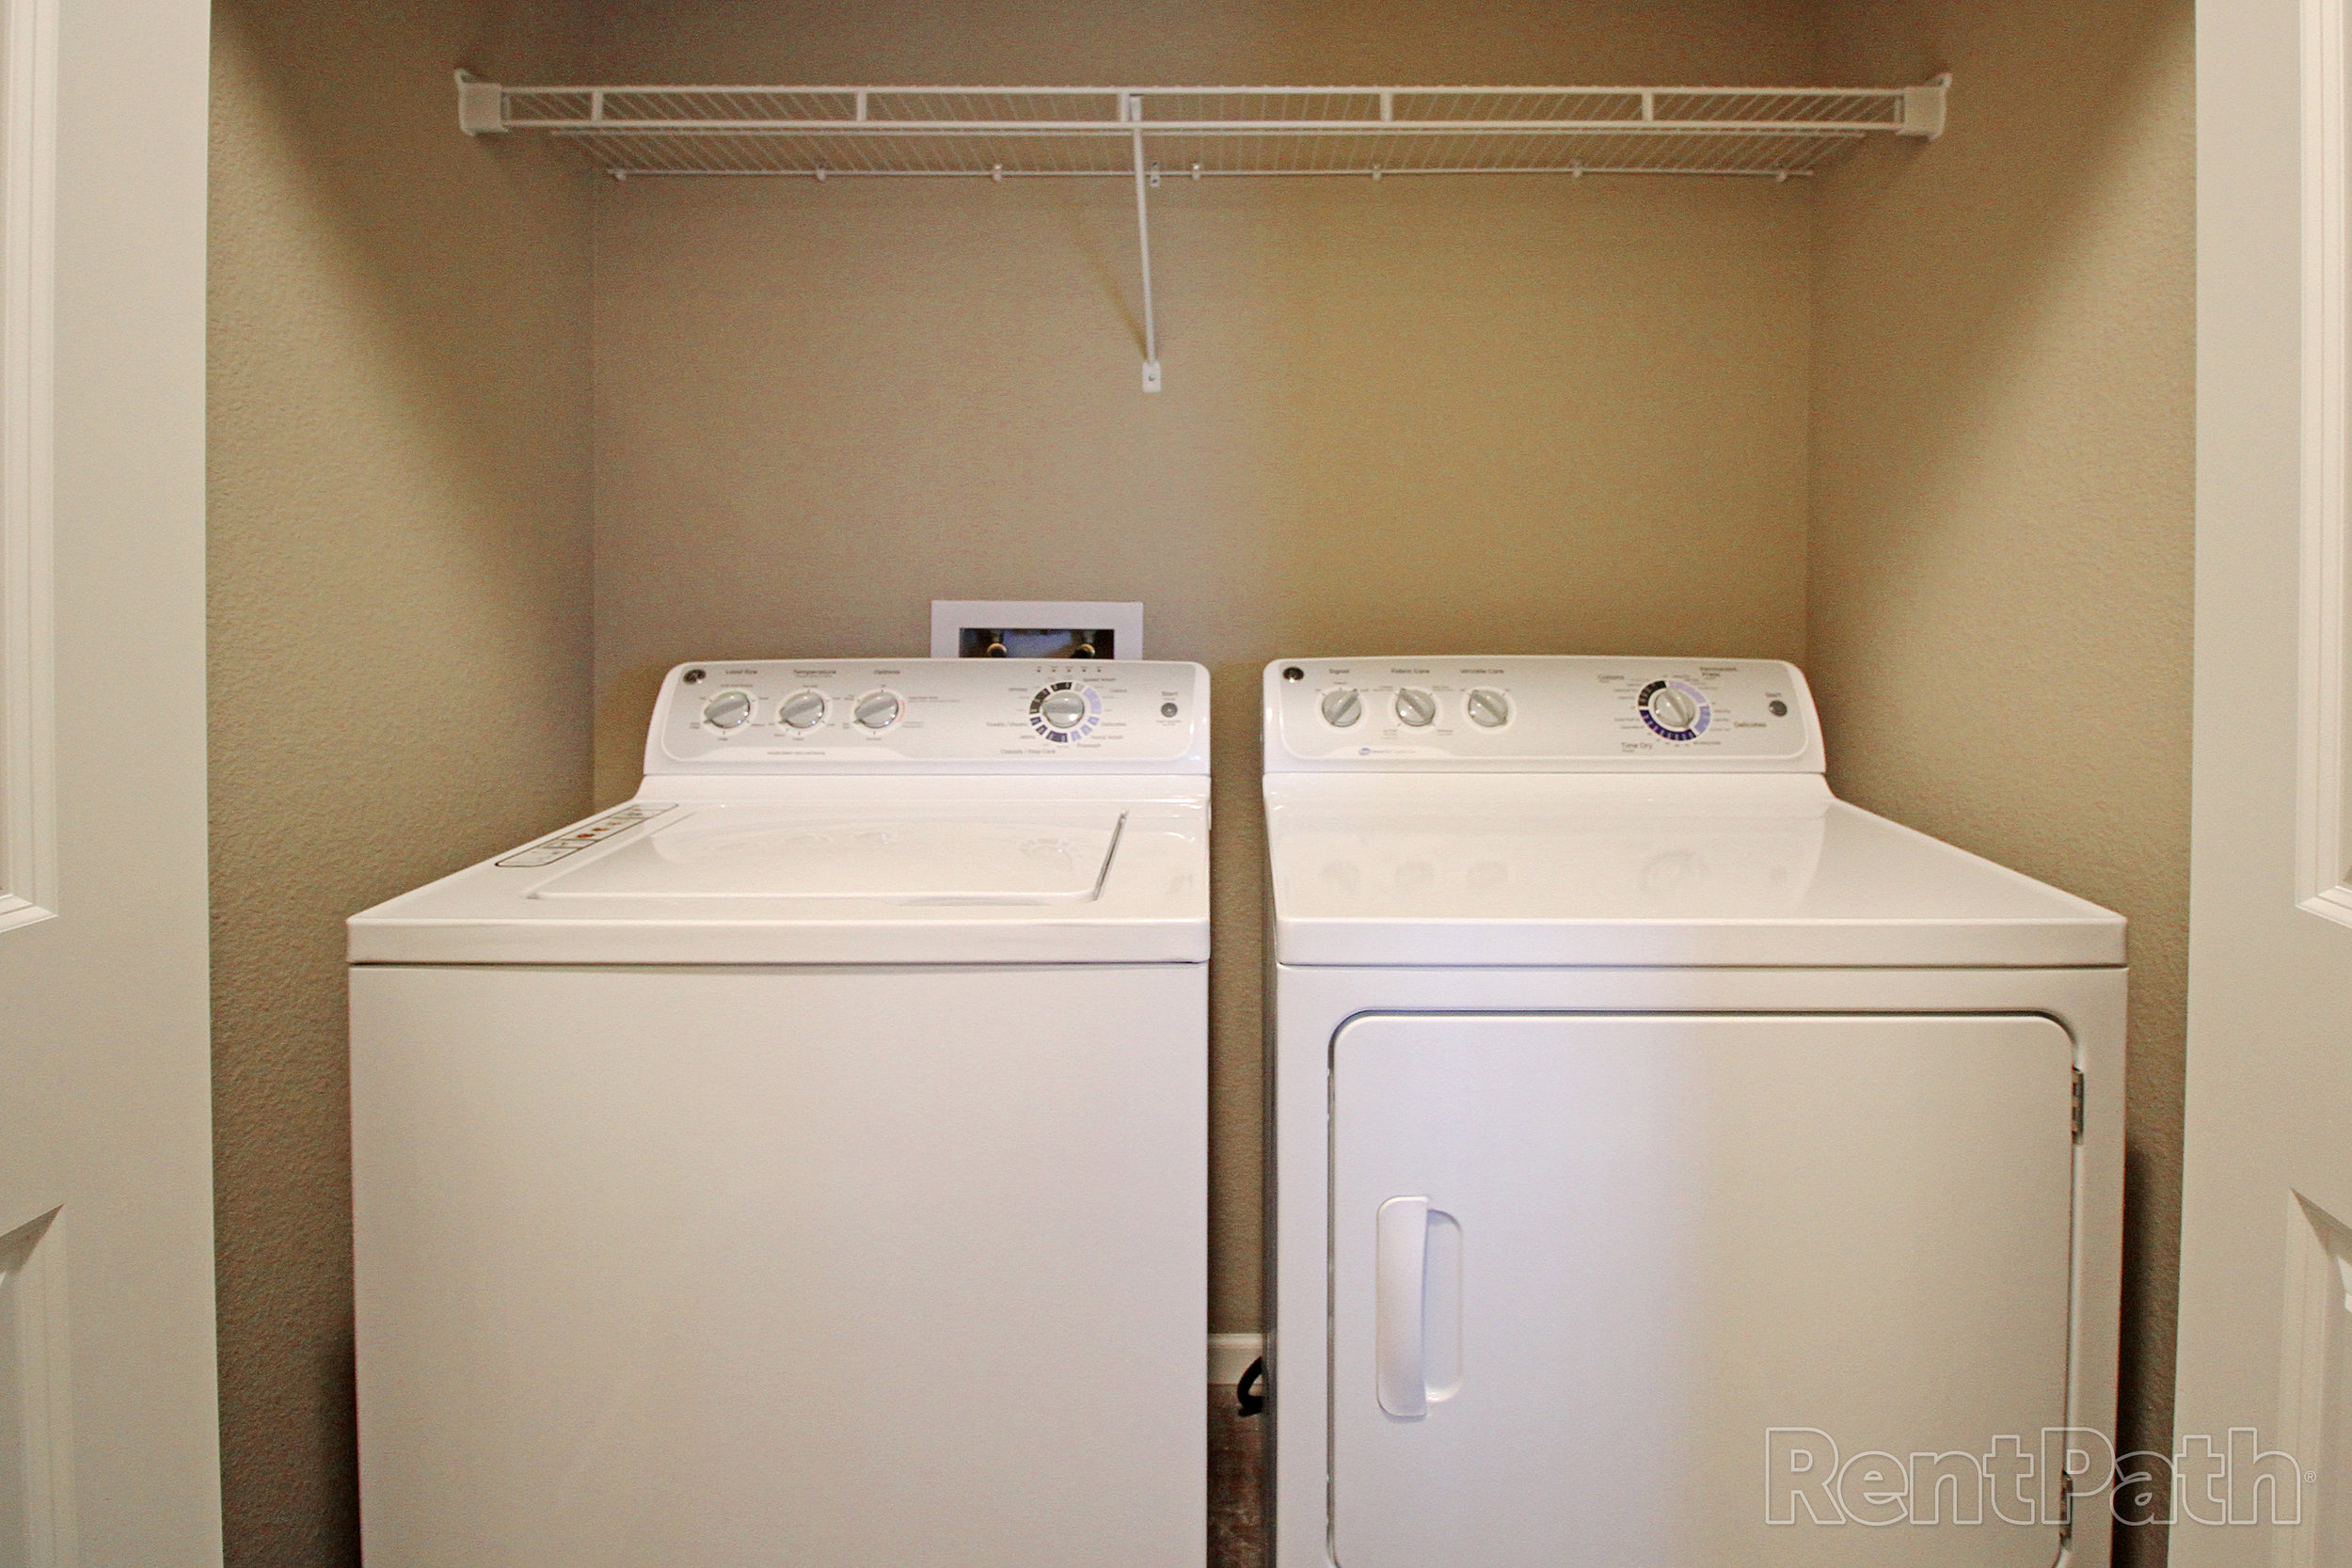 100053423_hdp_brookledge_int_fp1_laundry.jpg